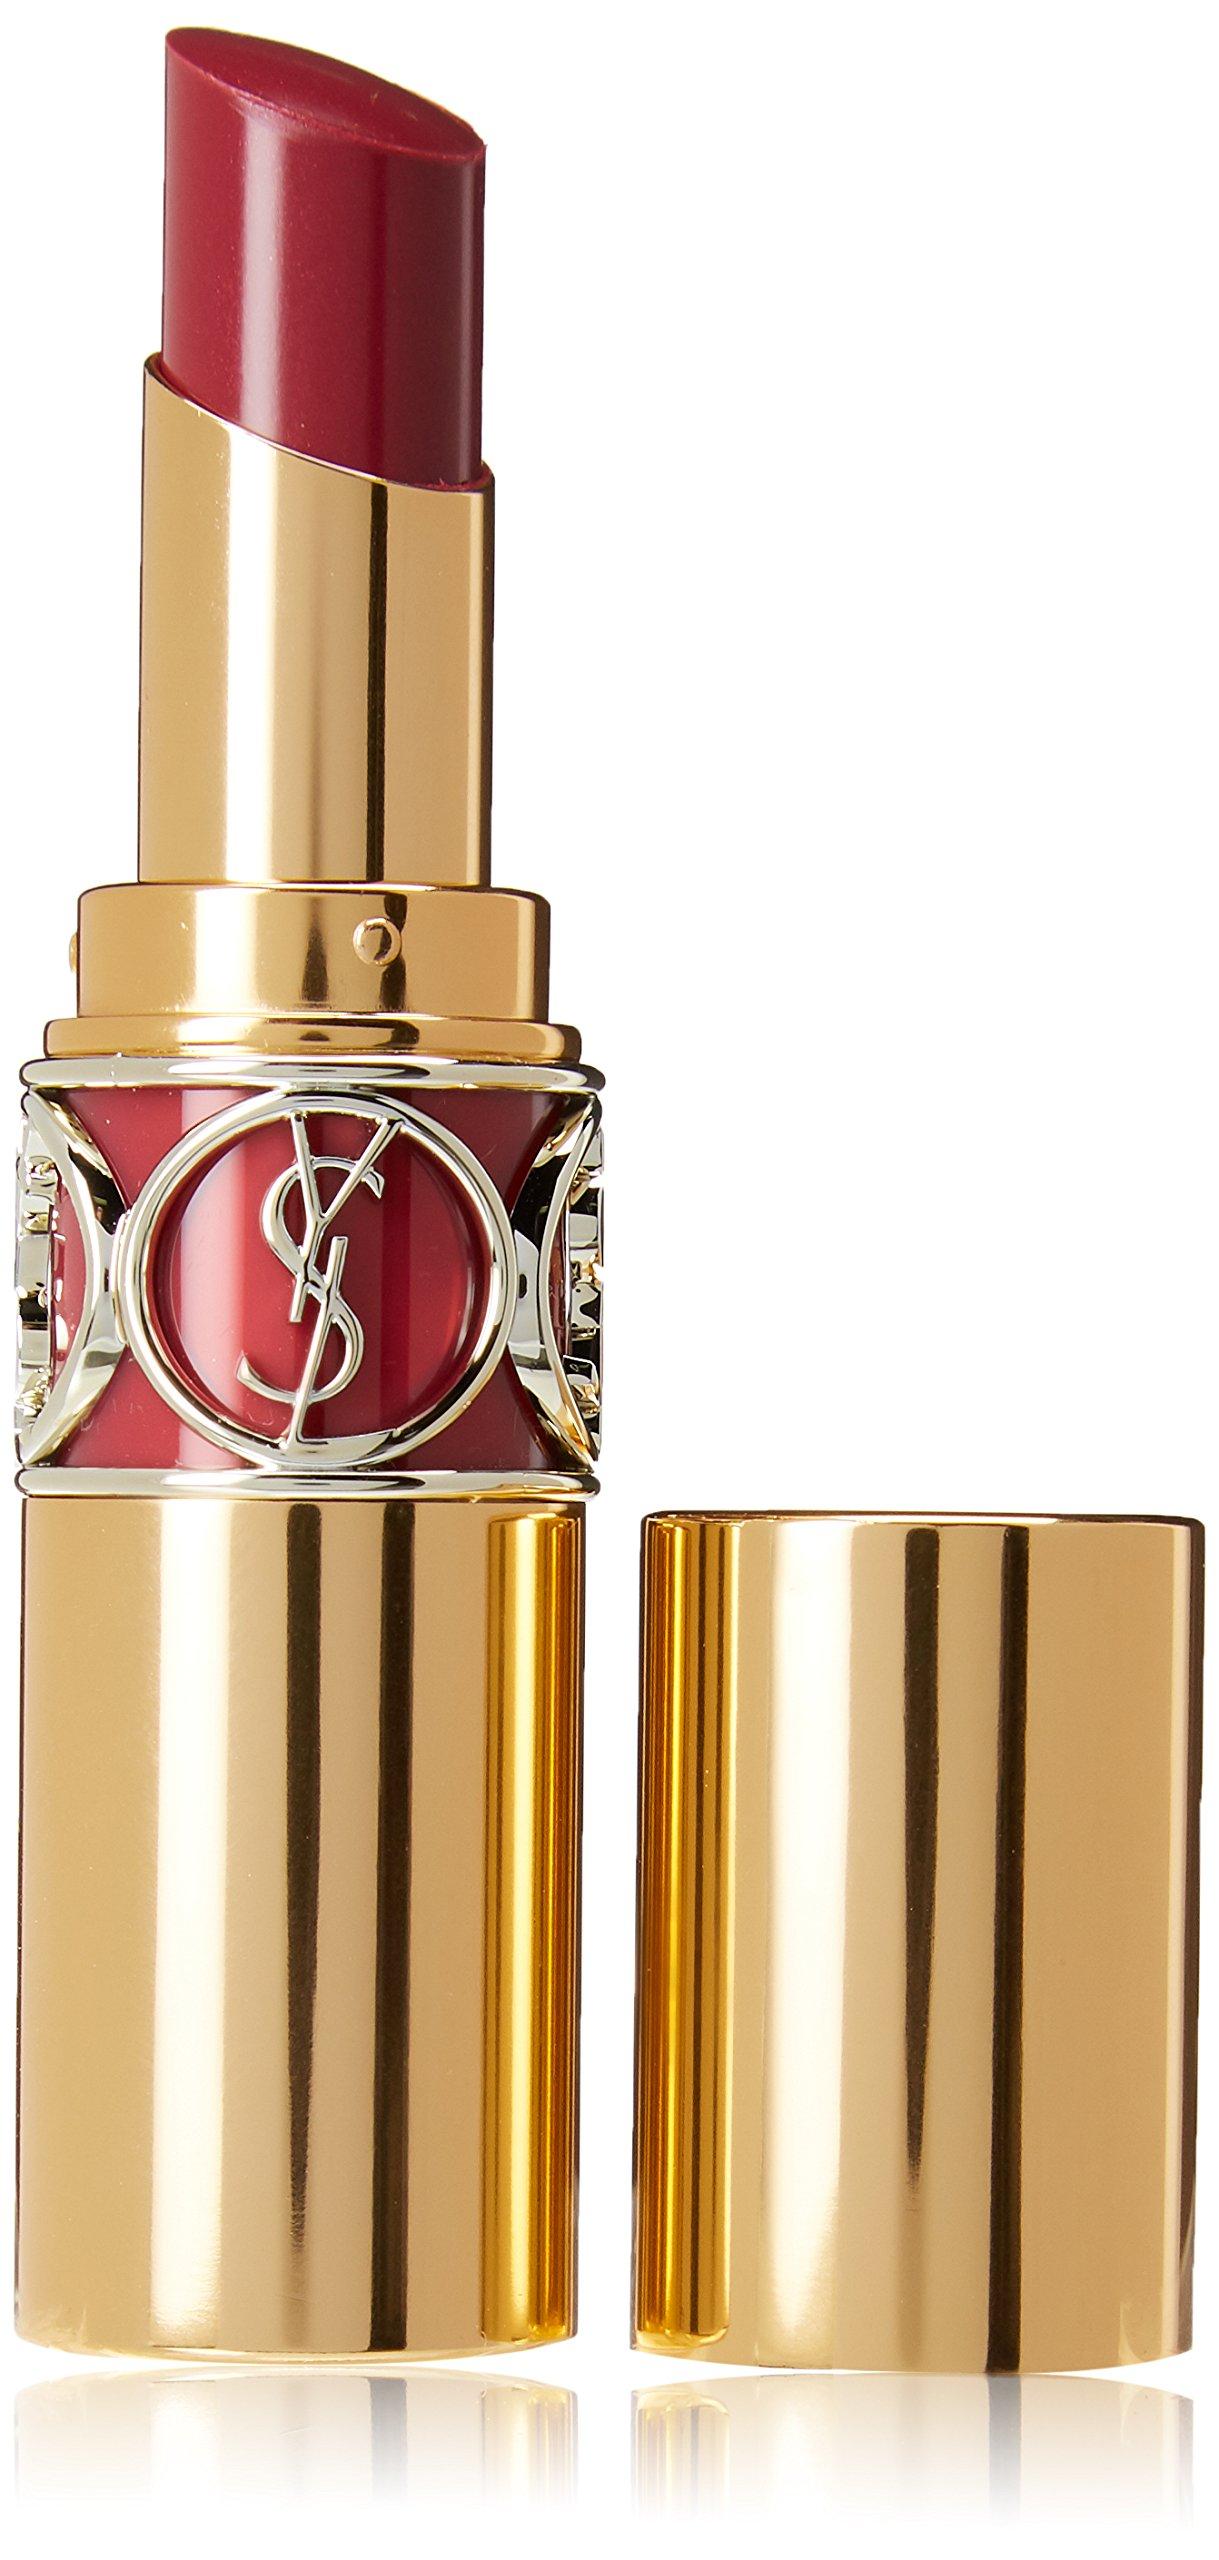 Amazon.com : Yves Saint Laurent Volupte Tint In Balm 5